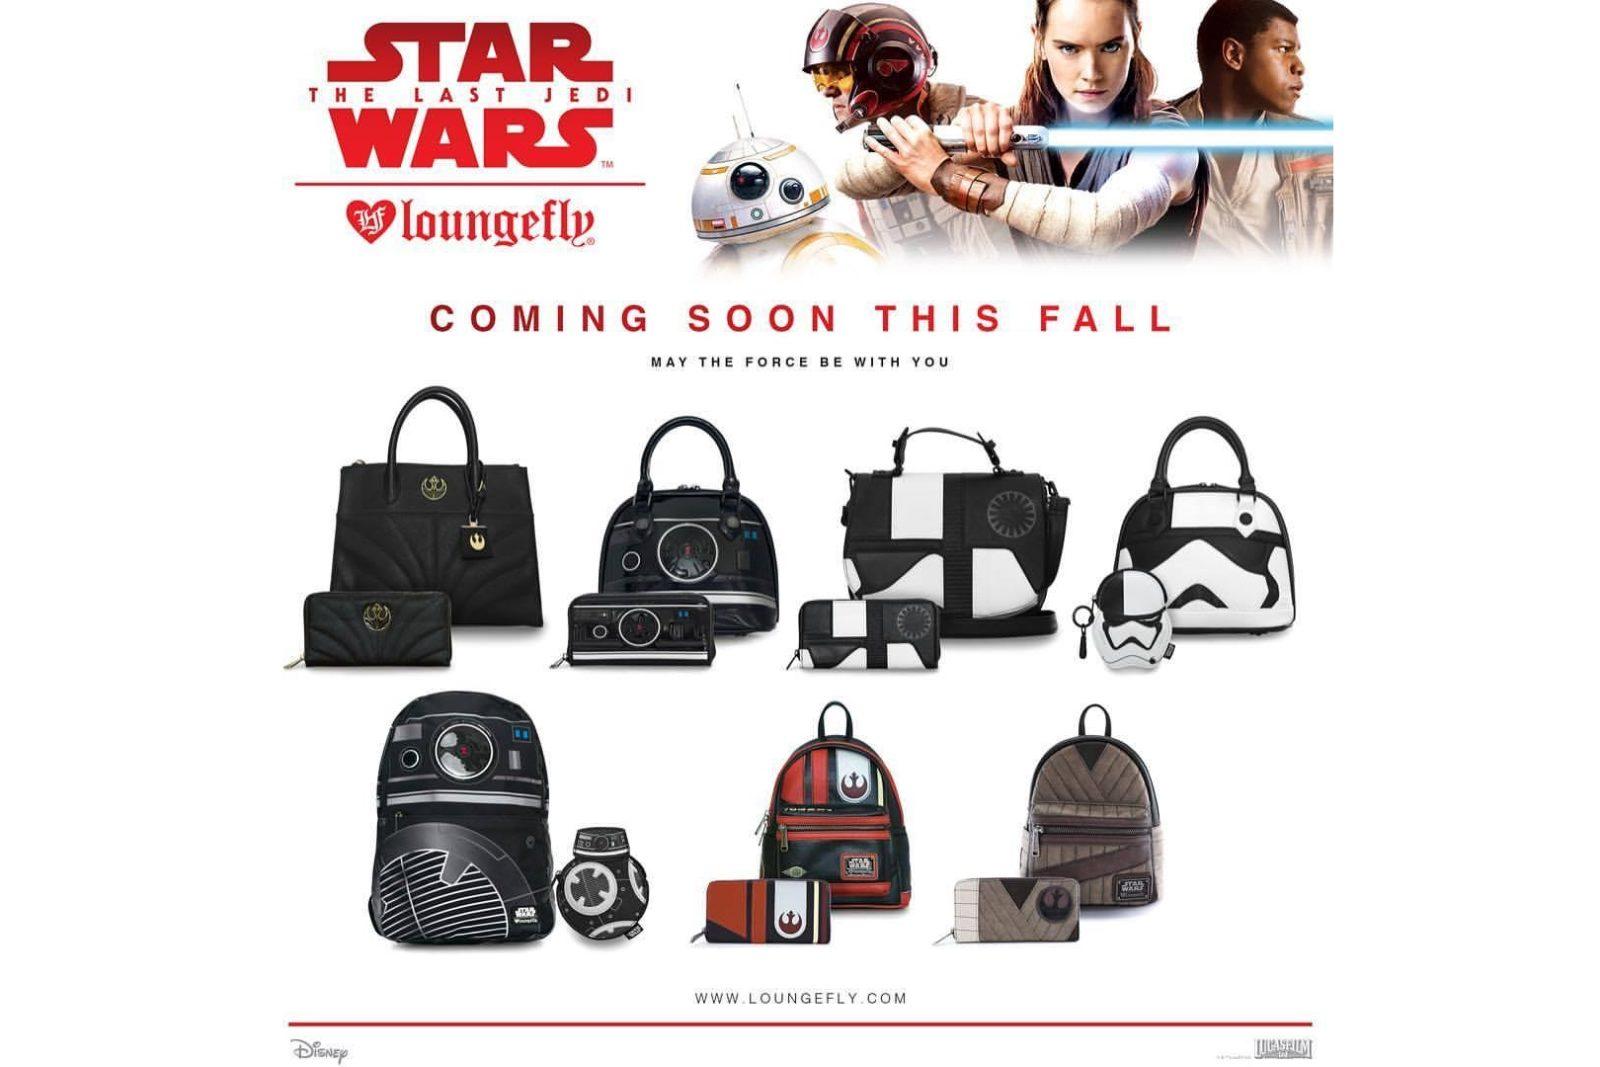 Loungefly x Star Wars The Last Jedi handbag range preview